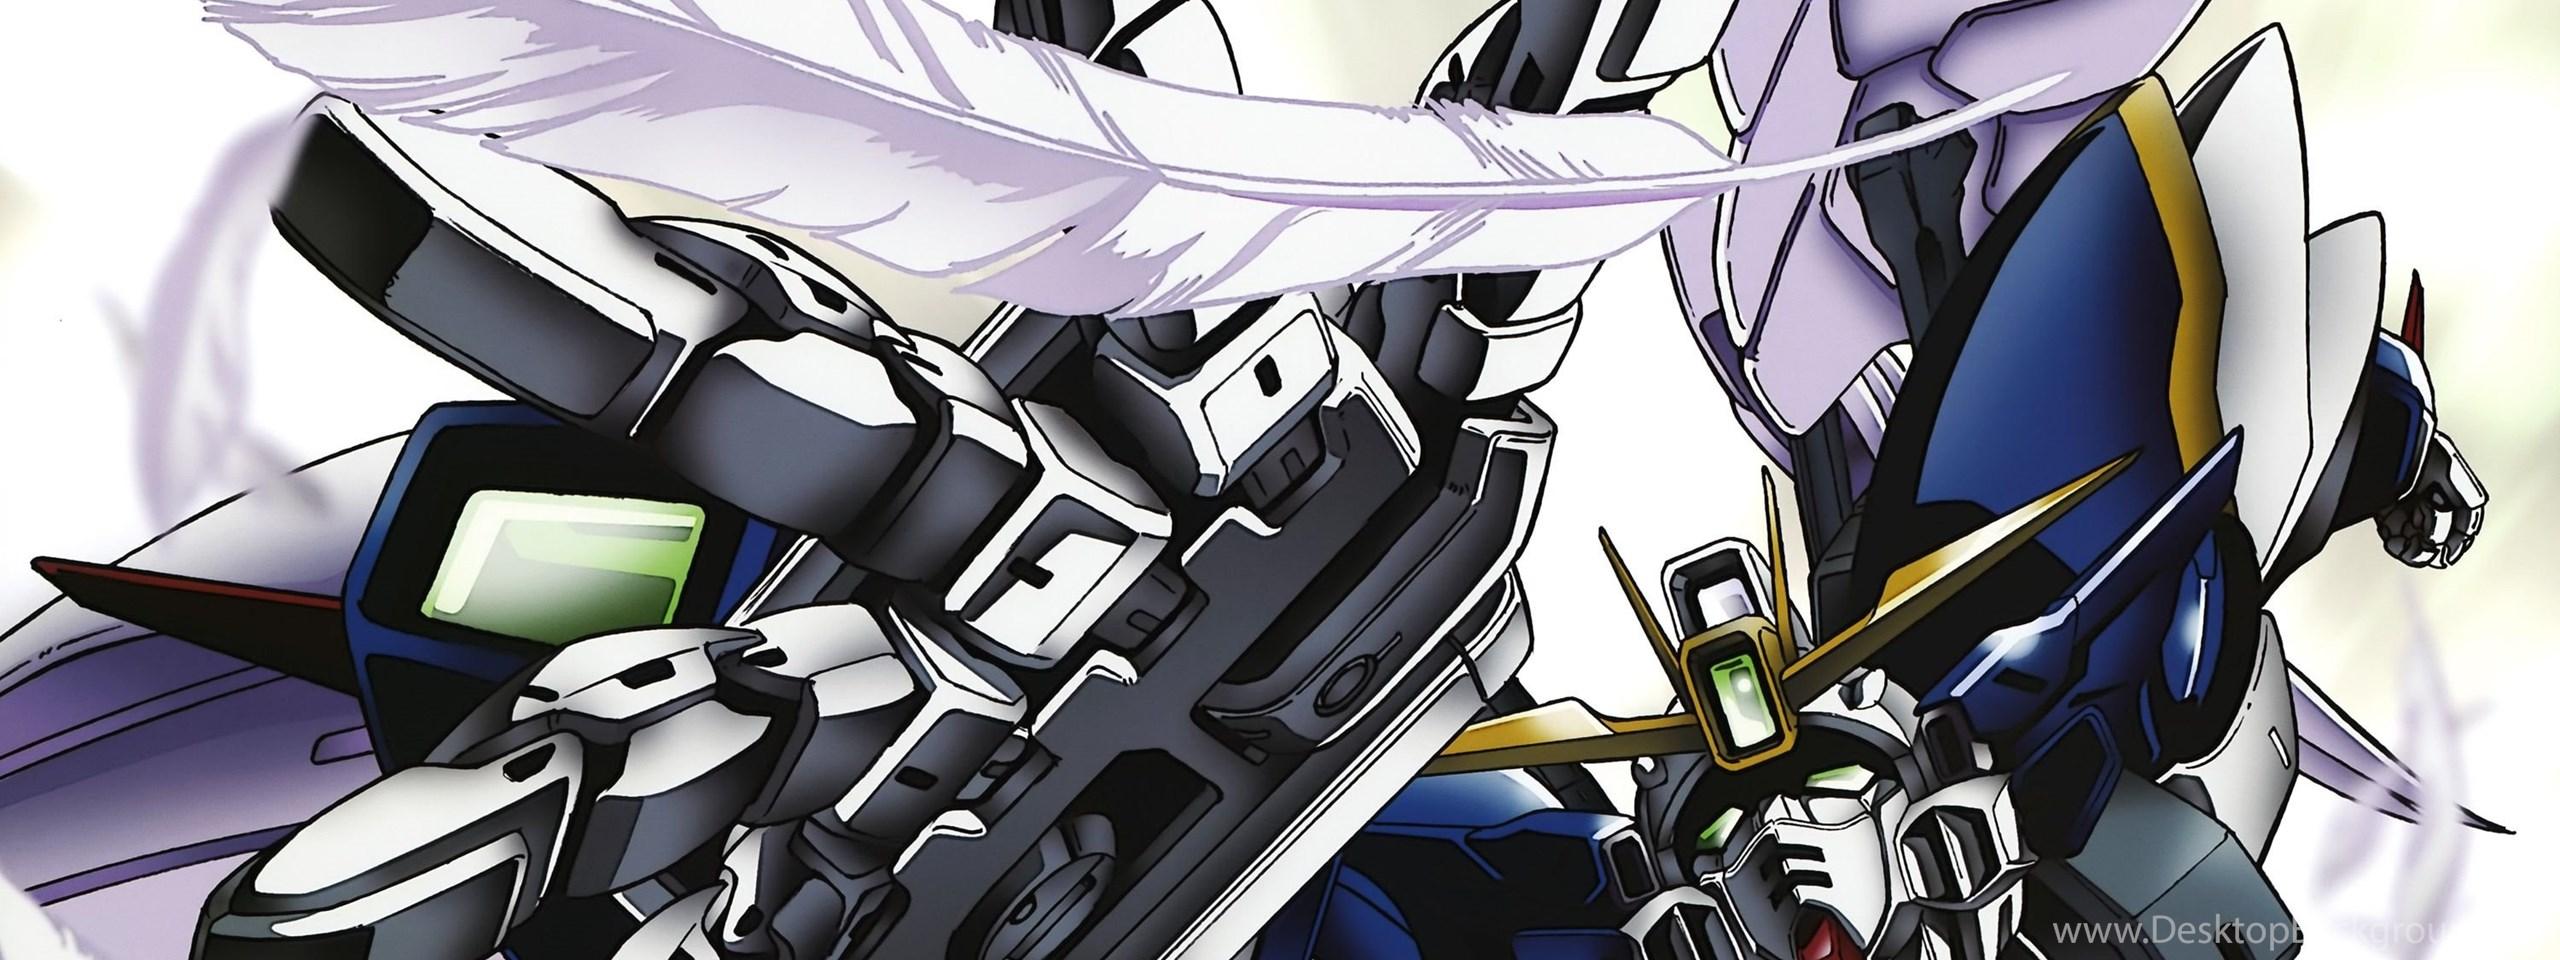 Gundam HD Wallpapers Page 2 Desktop Background